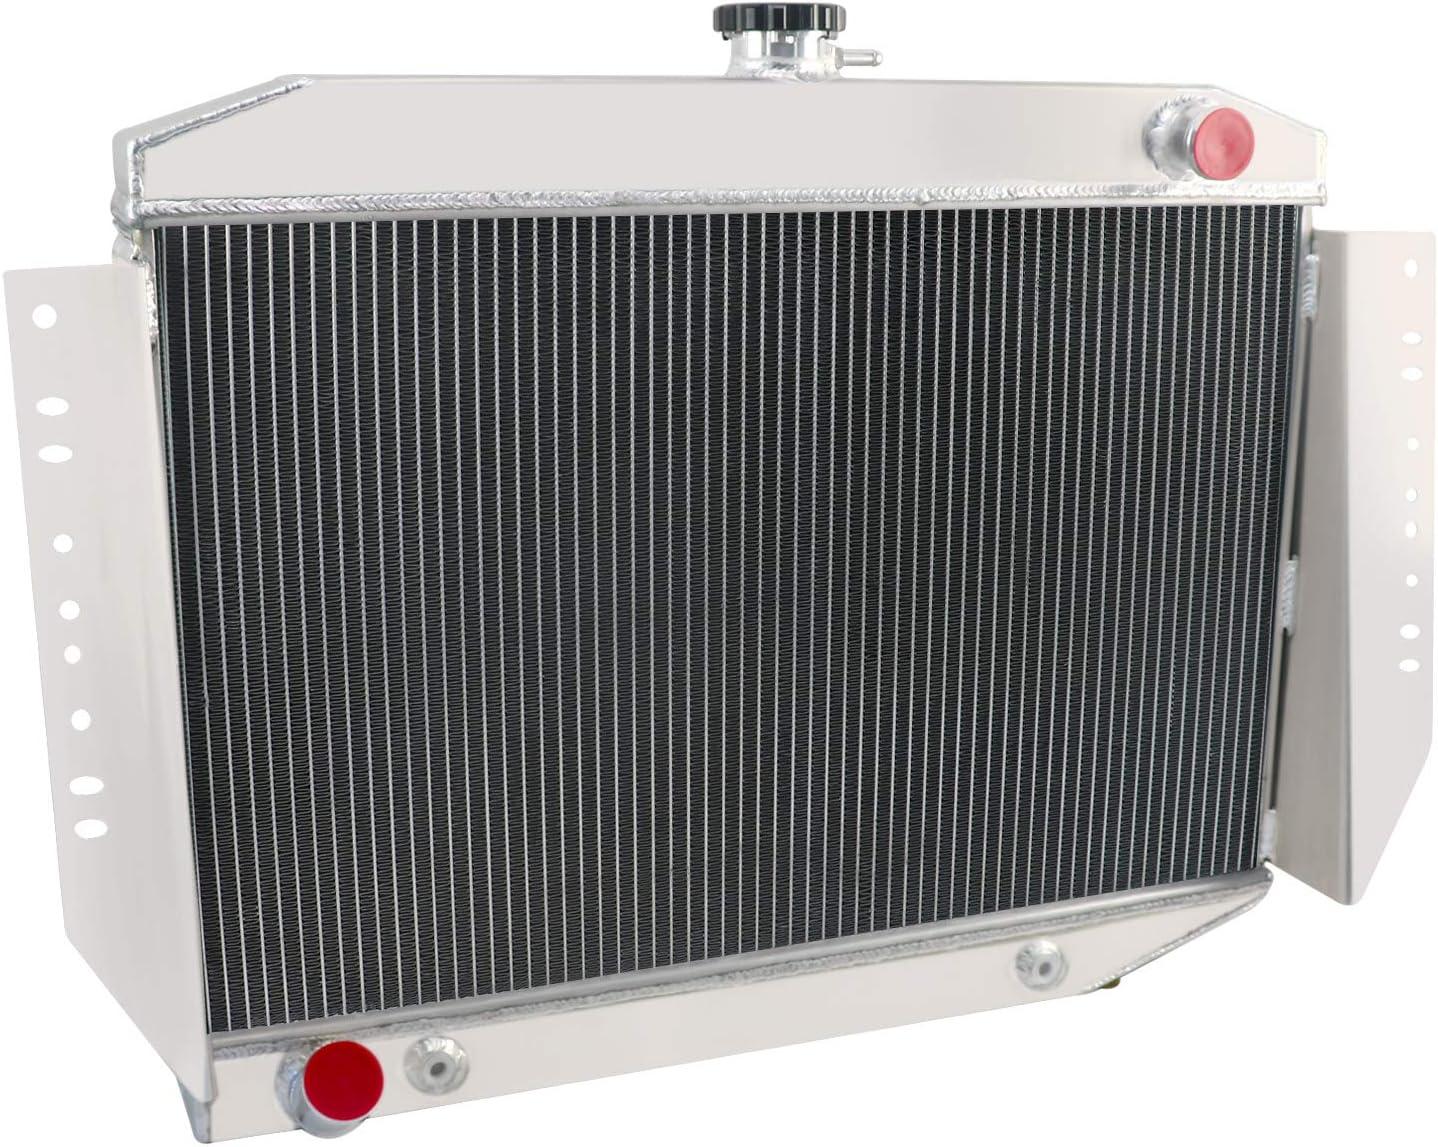 OzCoolingParts 4 Row Core All Aluminum Radiator for 1972-1979 73 74 75 76 77 78 Jeep Wagoneer//Cherokee//J-2500//J-2600//J-4500//J-4600//J-4700//J-4800//J10//J20//J-100 5.9L V8